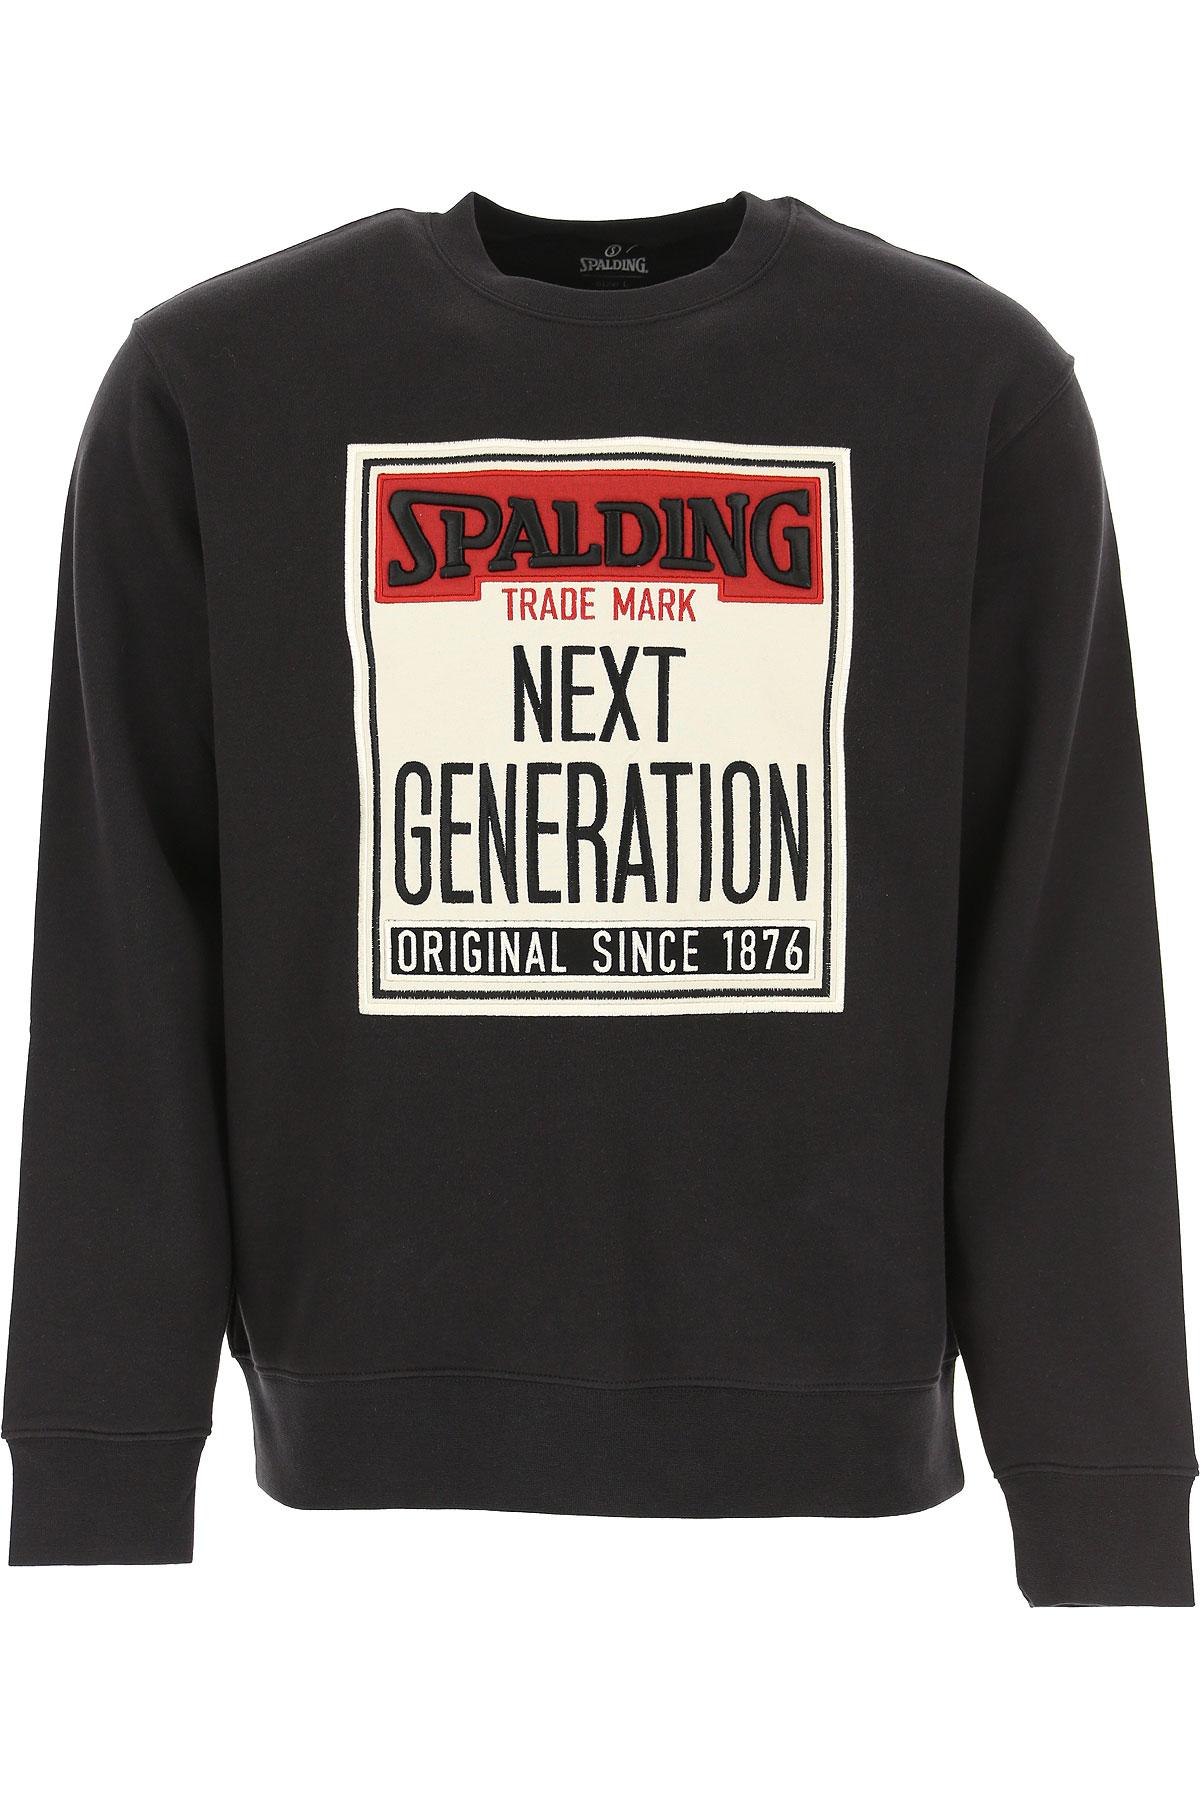 Spalding Sweatshirt for Men, Black, Cotton, 2019, L XL XXL